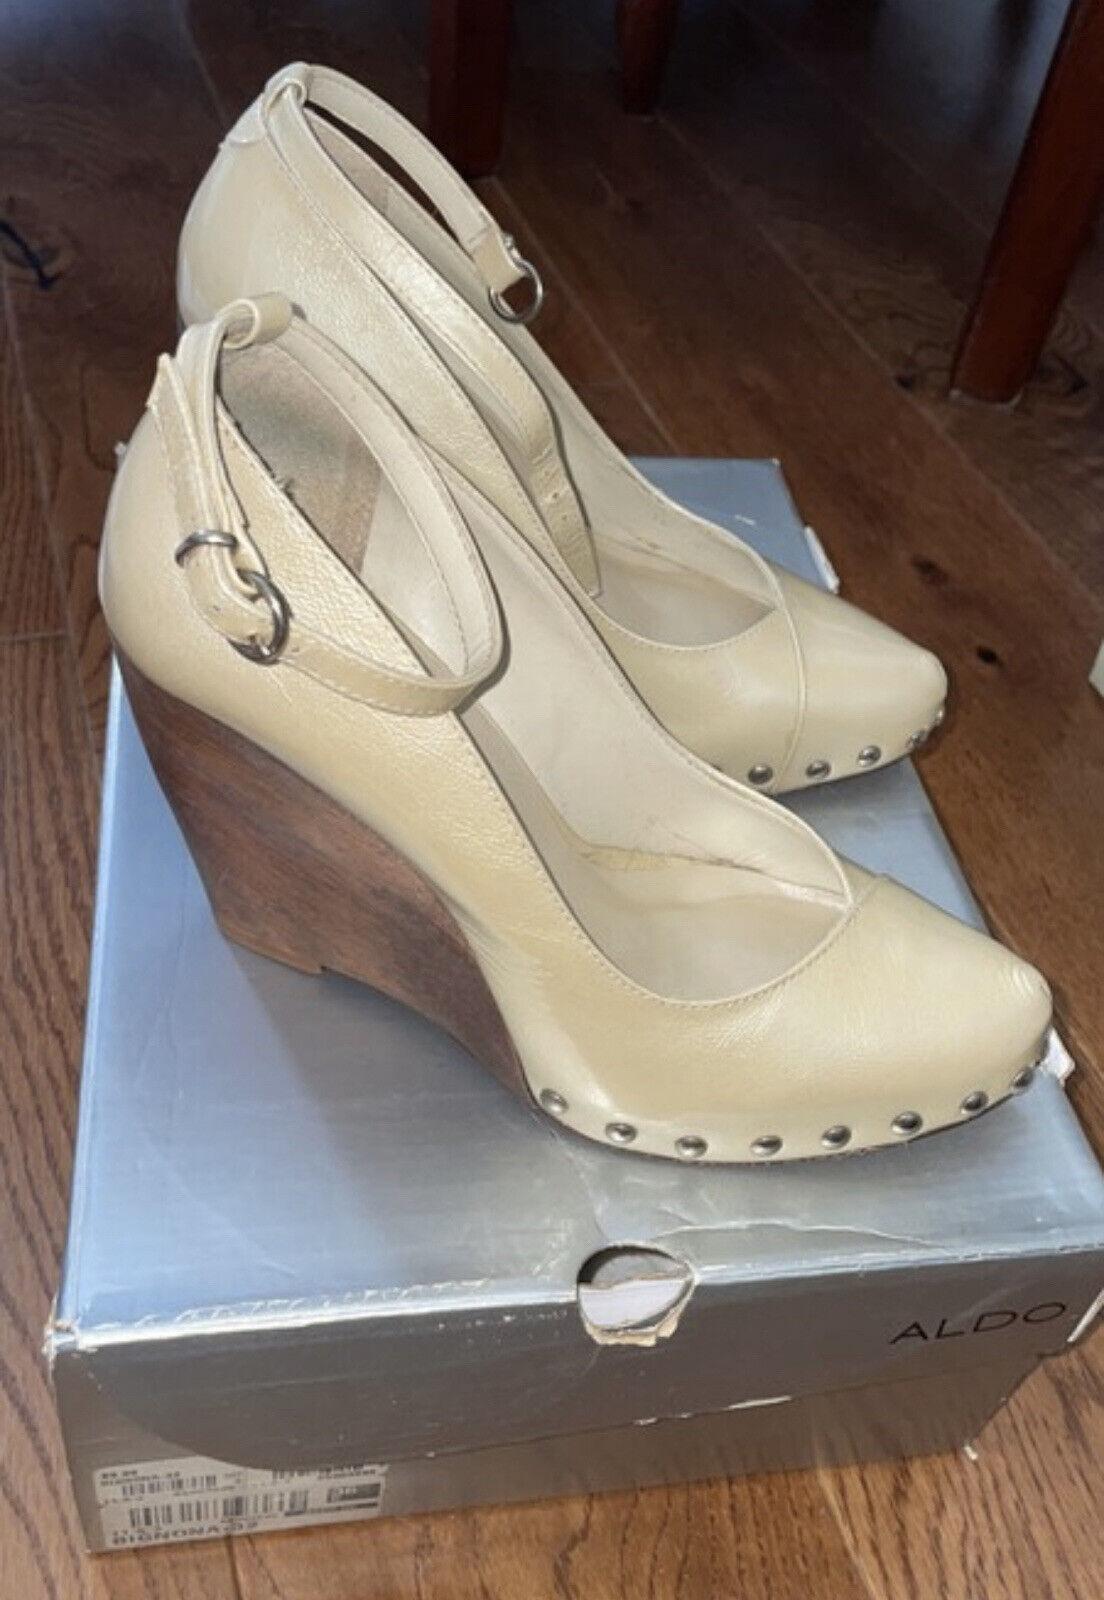 Ladies Aldo Cream Leather Wedges Size 3 Good Condition